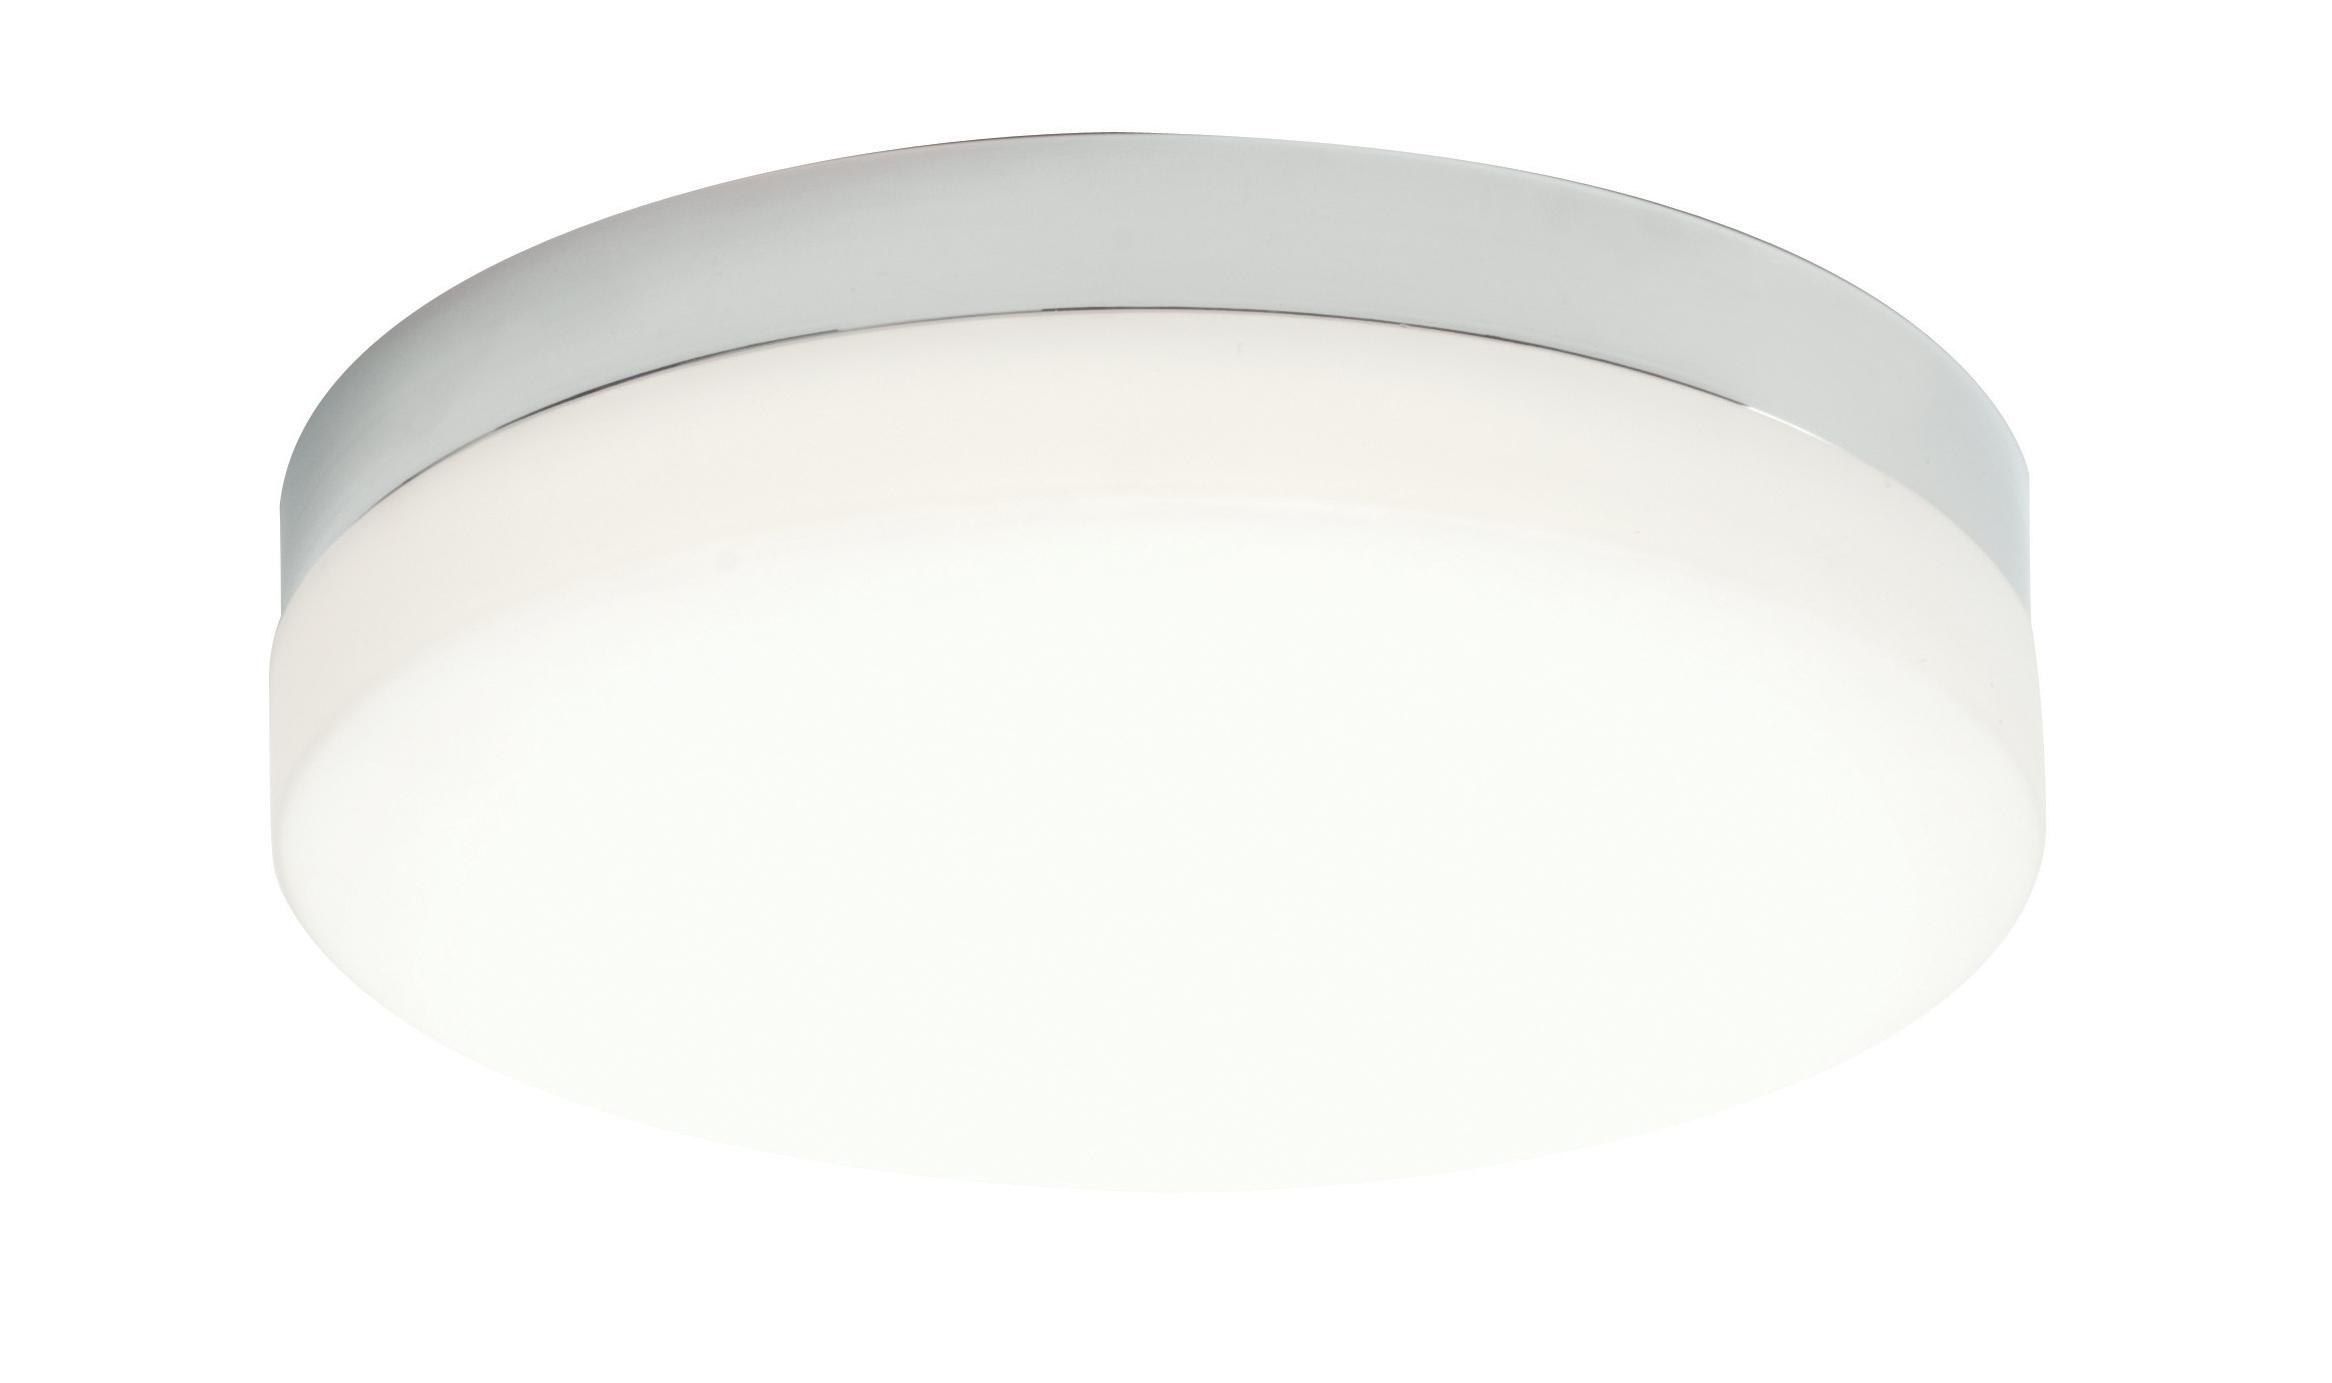 Saxby pur moyen 39611 rond lampe plafond salle de bain 22w for Lampe plafond salle de bain